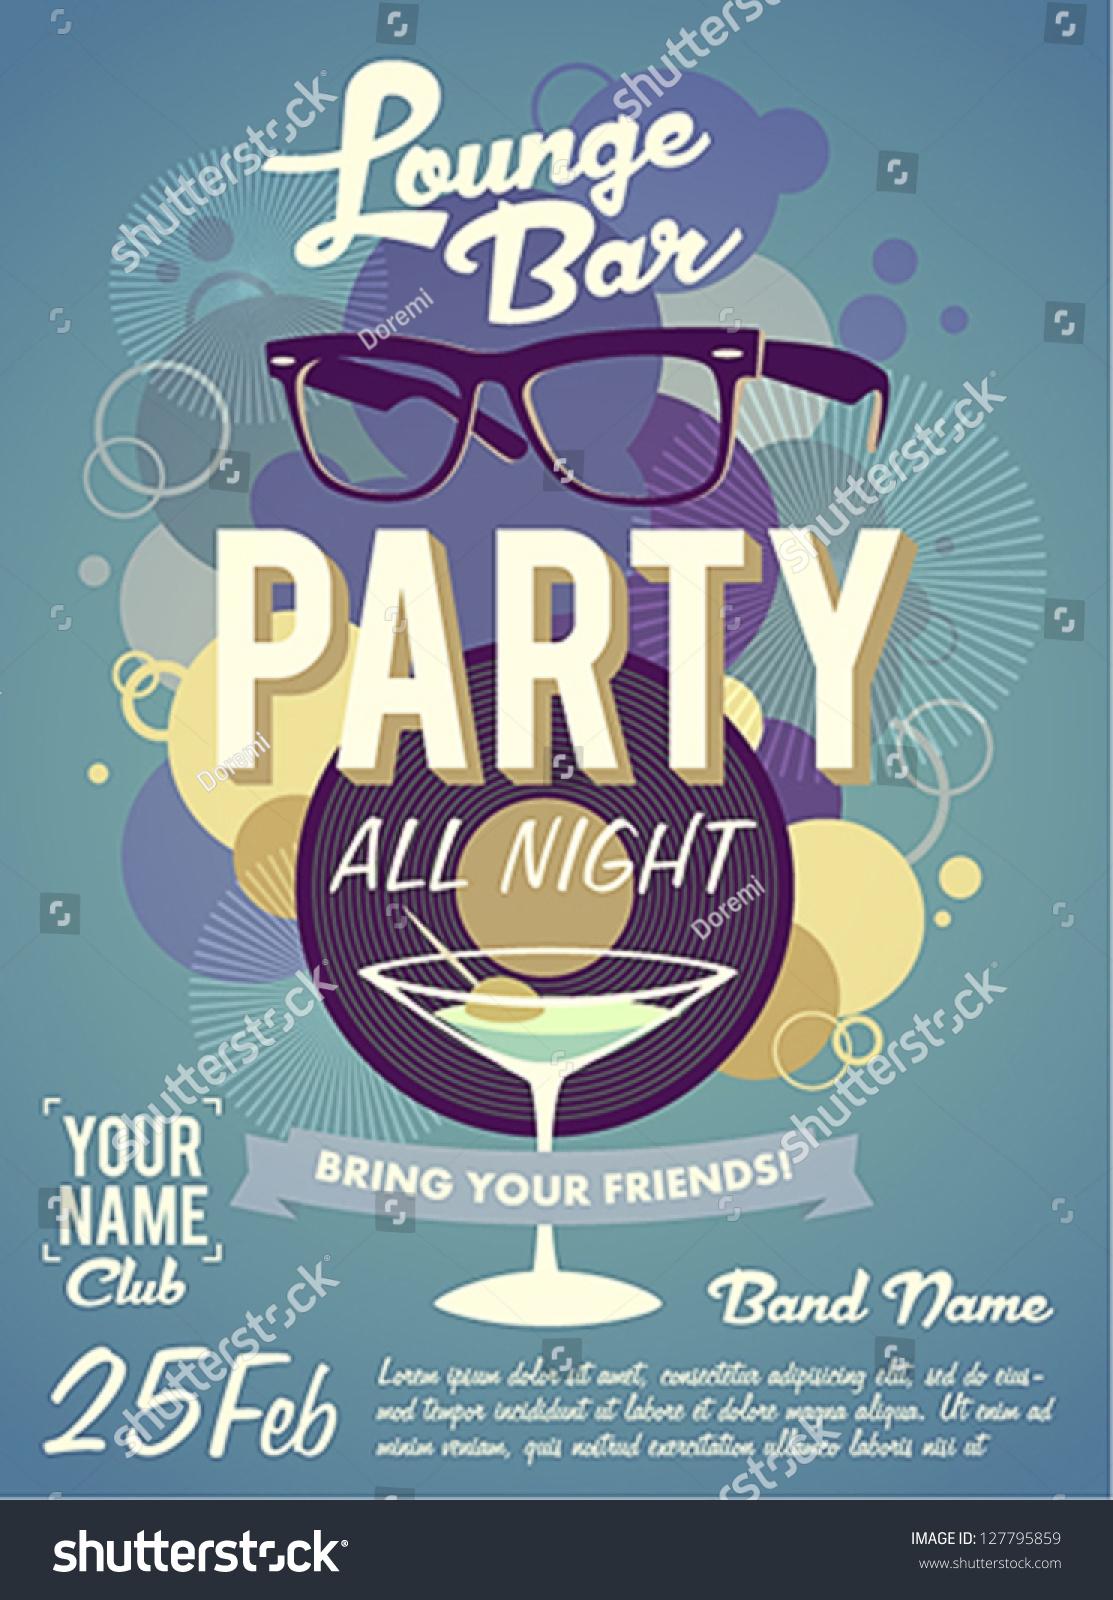 Lounge Bar Party Poste...